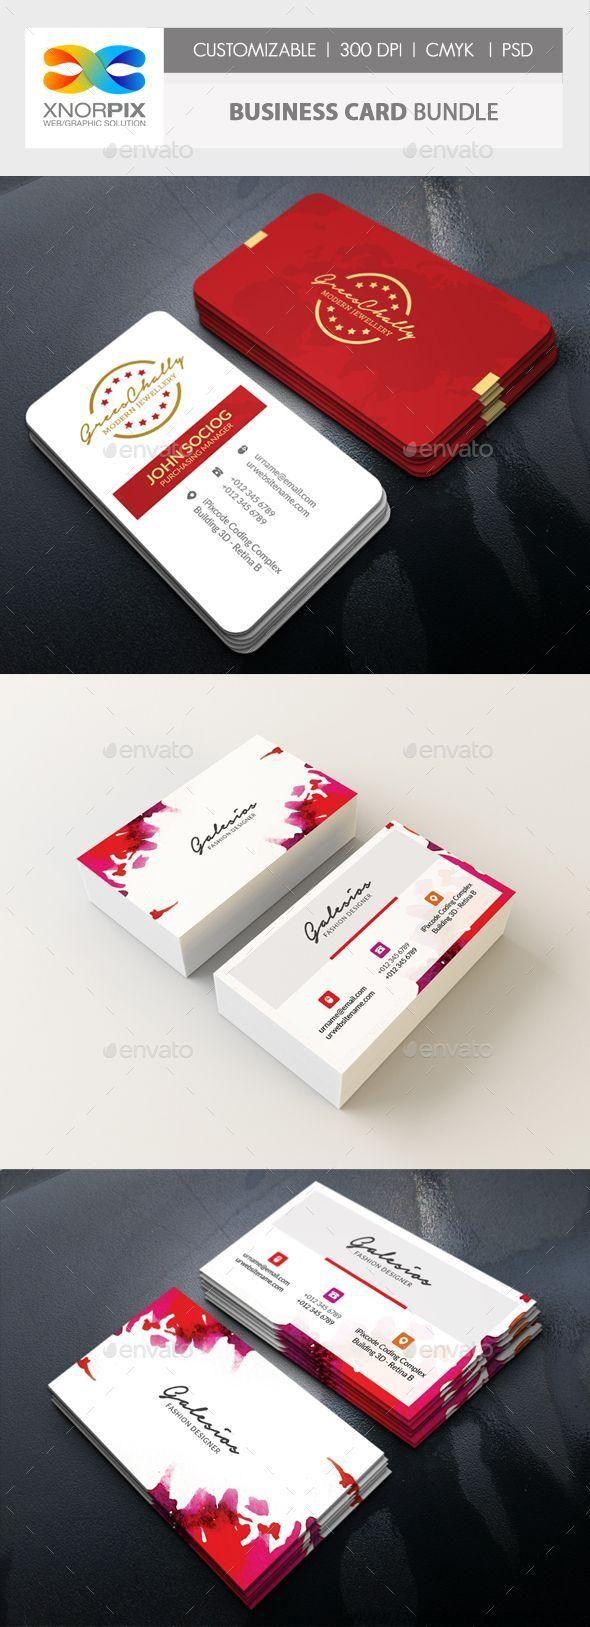 Business Card Bundle Corporate Business Cards